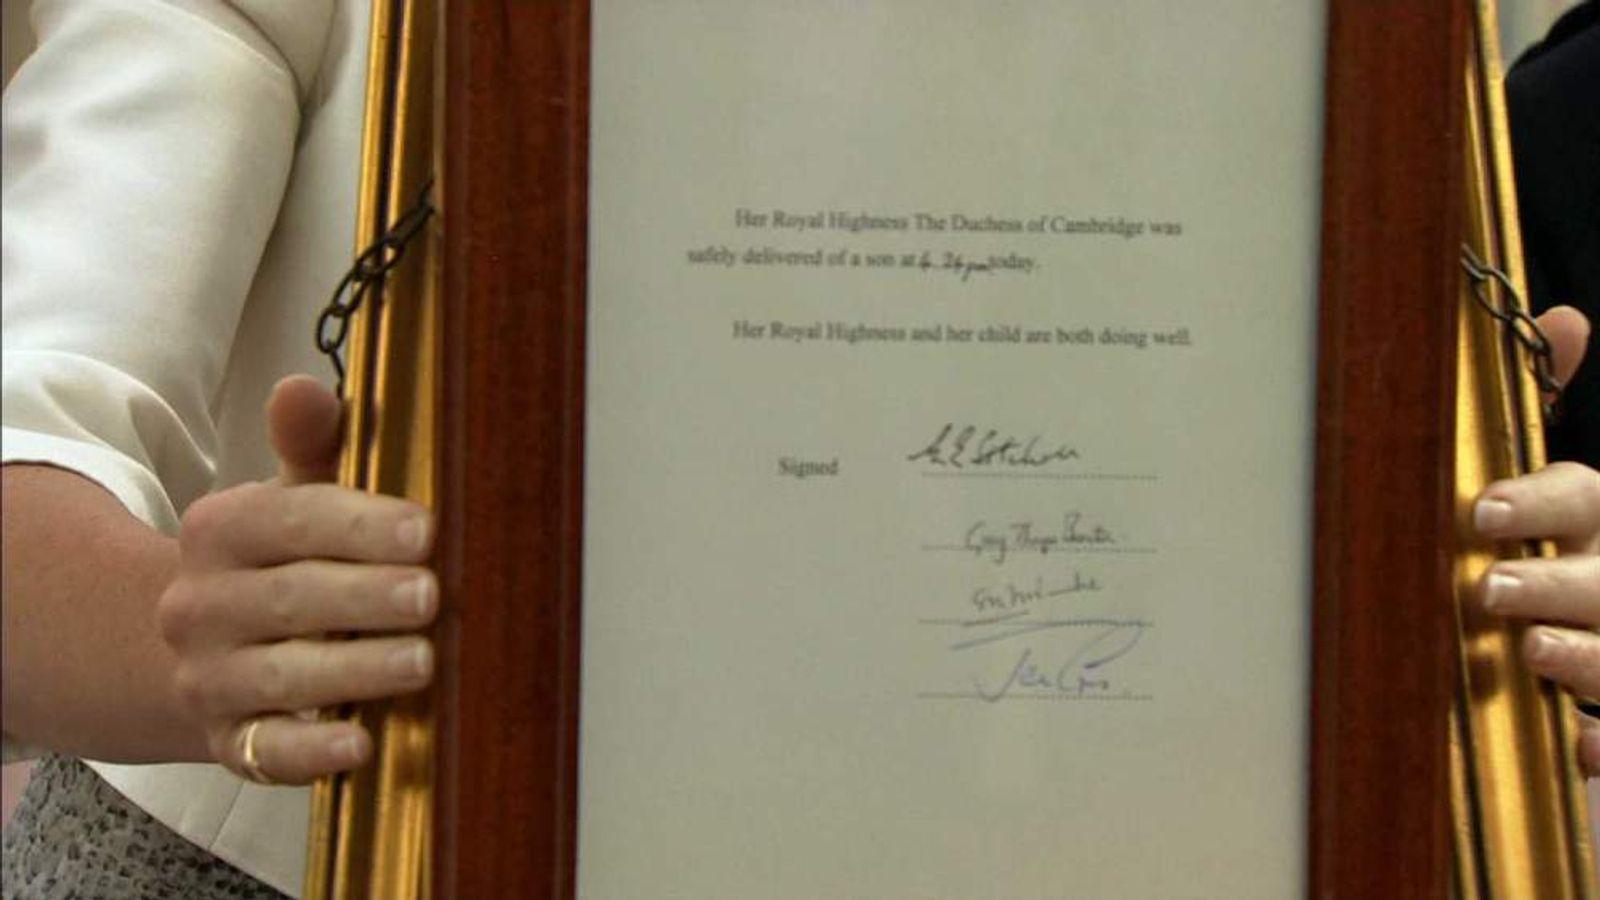 Notice of birth Buckingham Palace